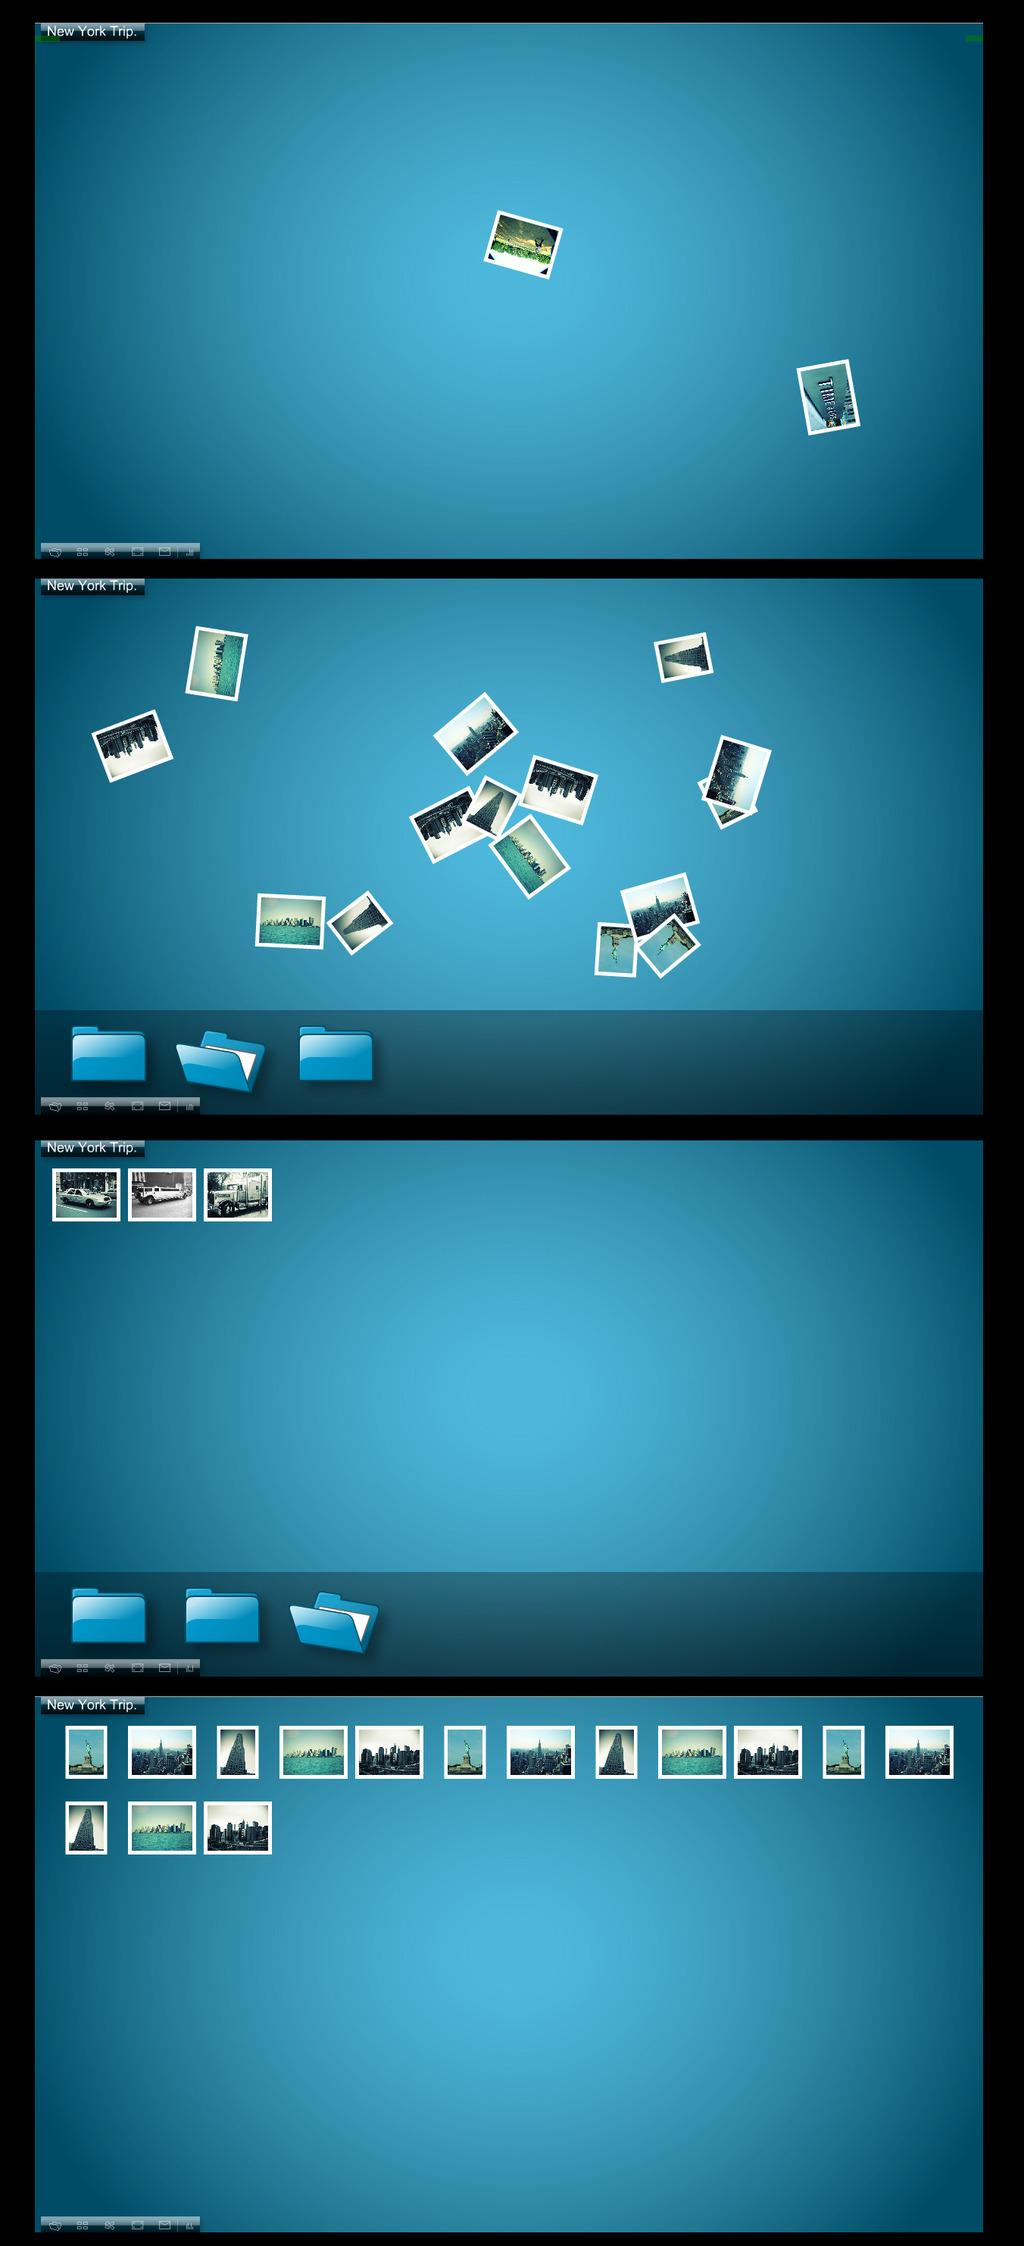 ui设计 网页设计模板 其他flash源文件 > 漂亮实用的flash+xml相册